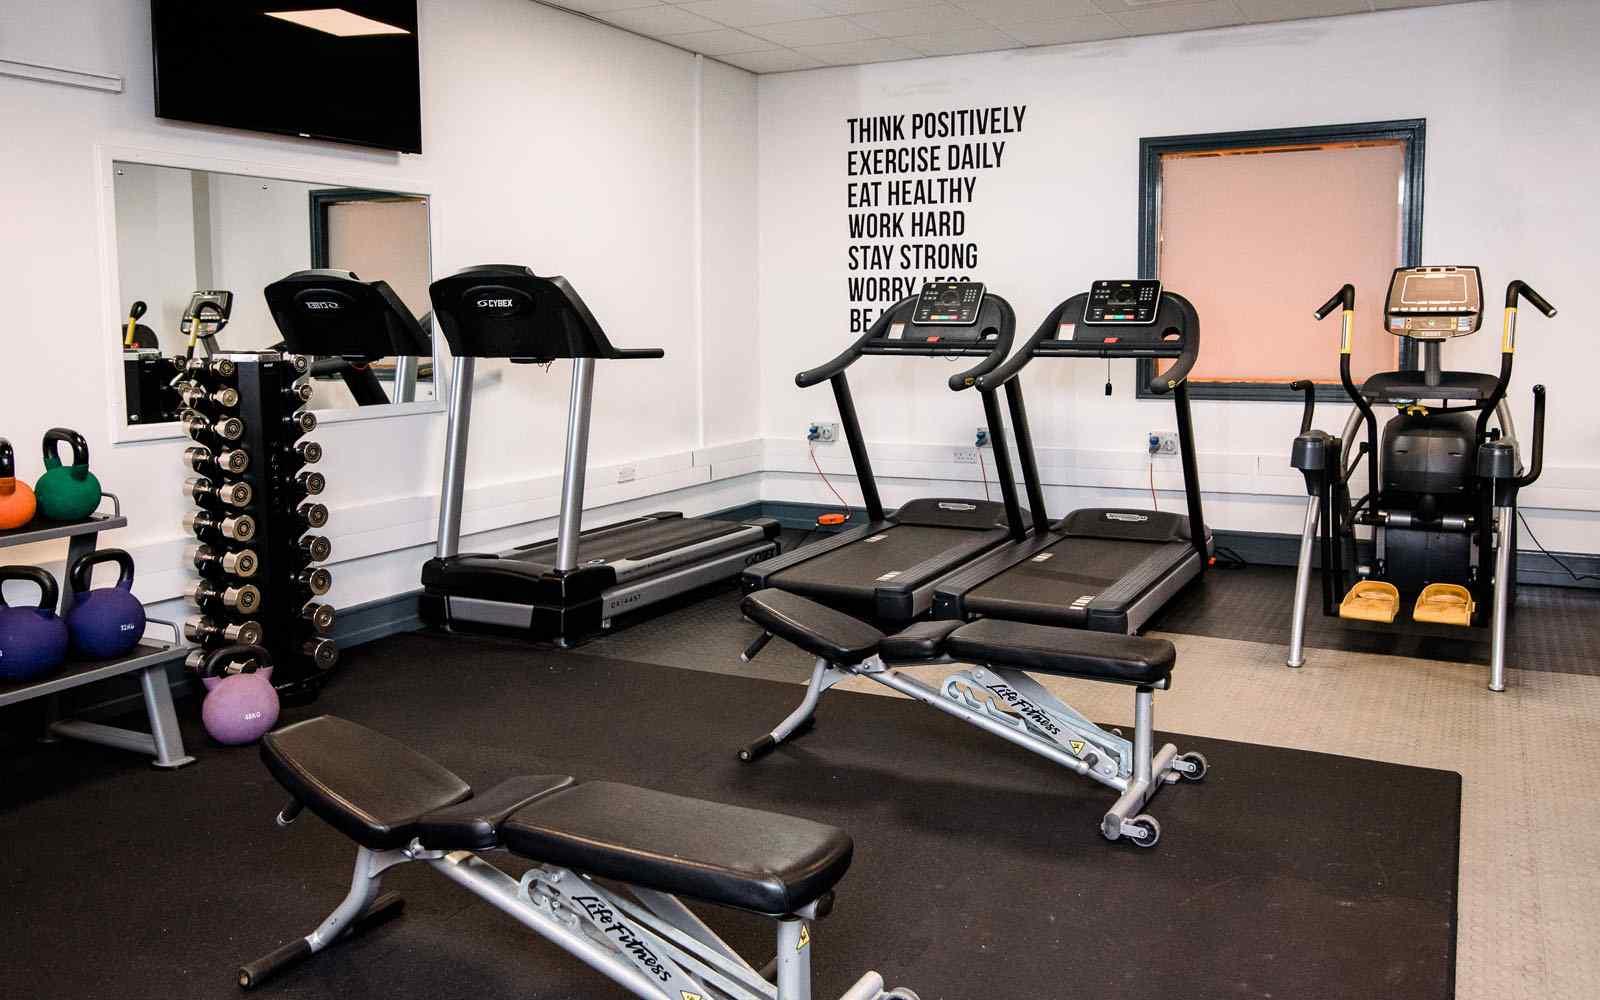 Treadmills in fitness suite